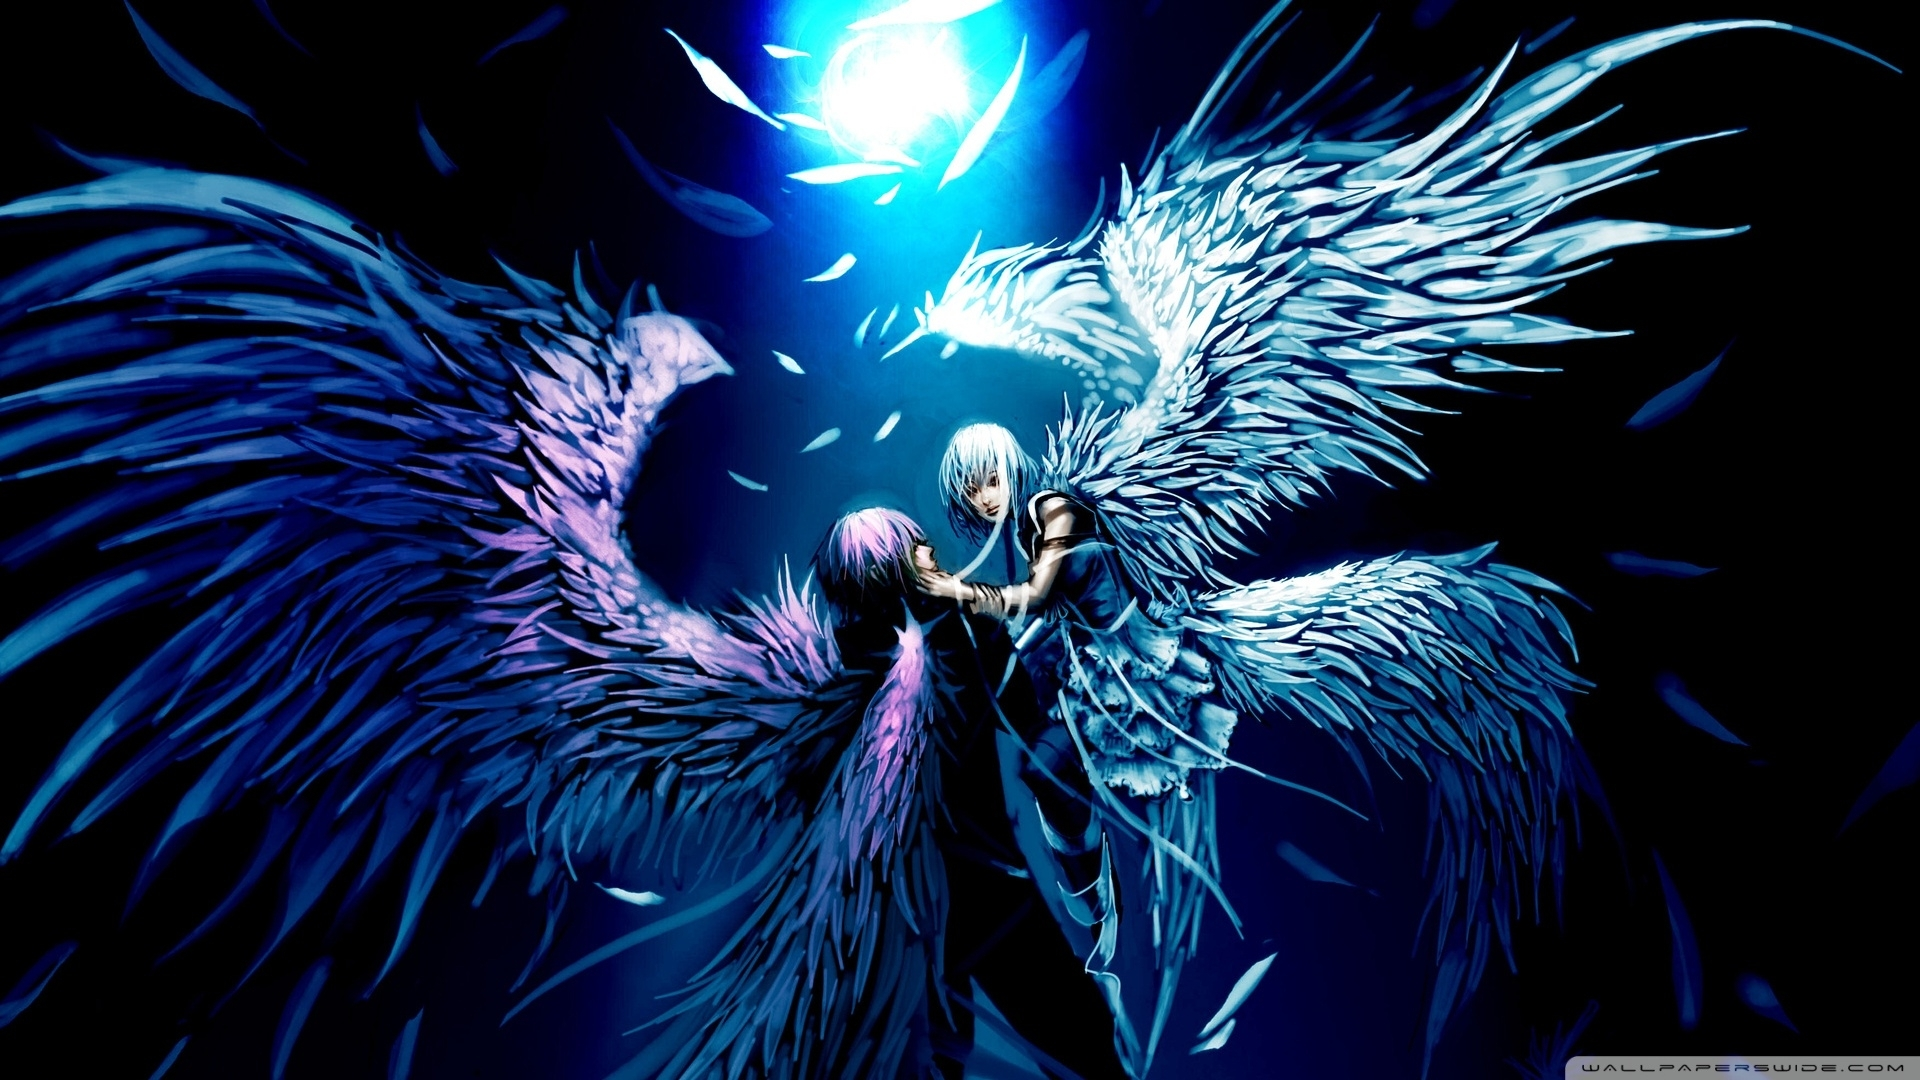 two angels love anime e29da4 4k hd desktop wallpaper for 4k ultra hd tv